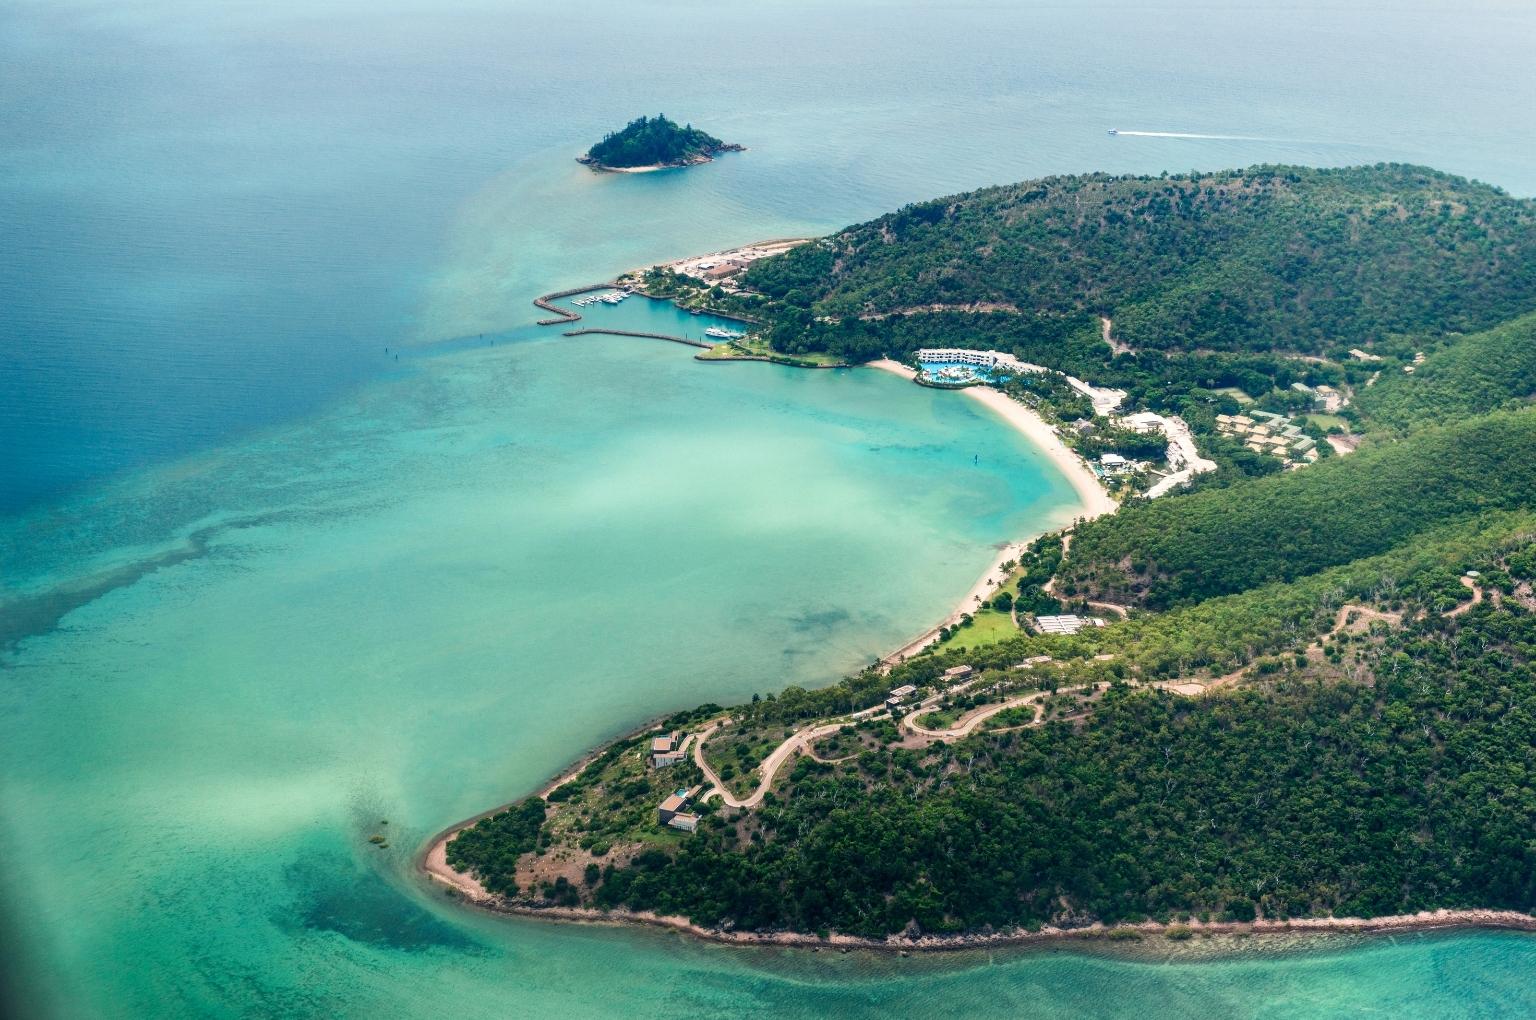 Luxurious Hamilton Island